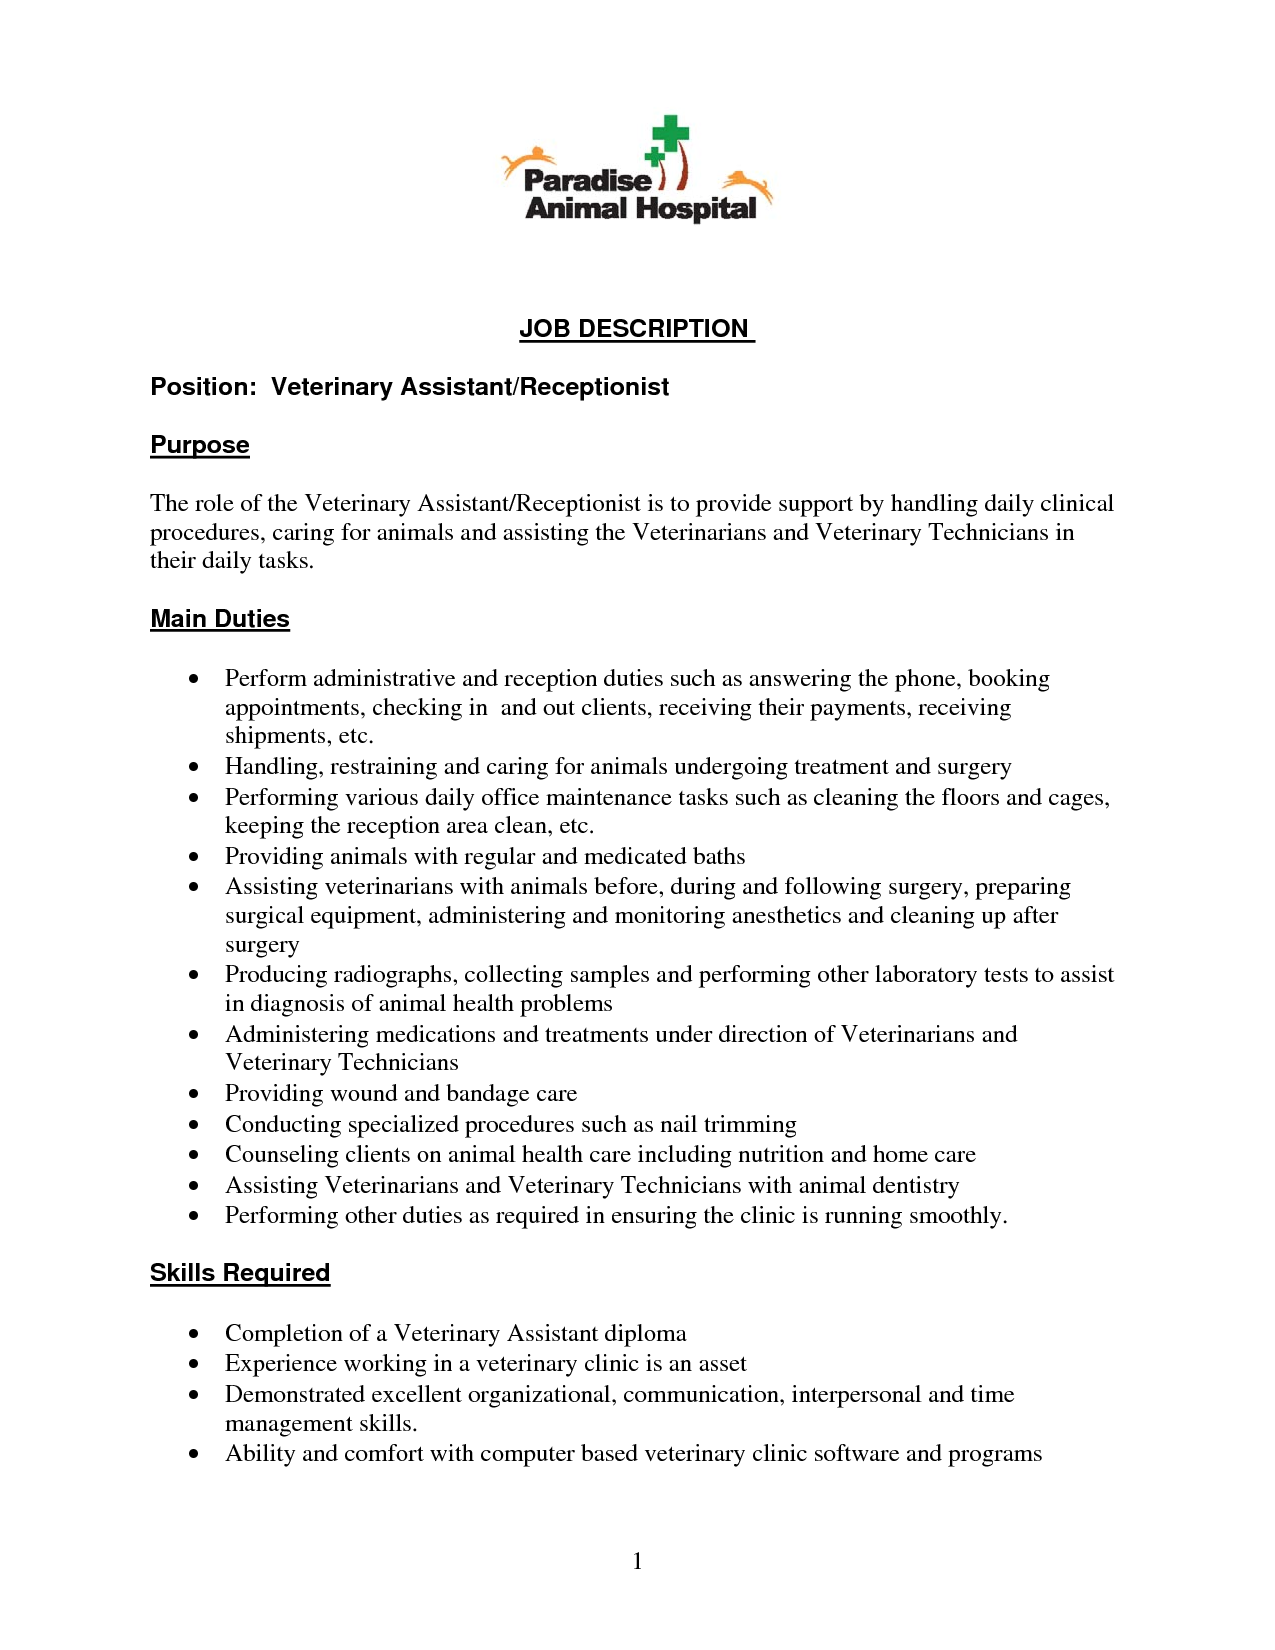 Resume Examples Veterinary Receptionist Receptionist